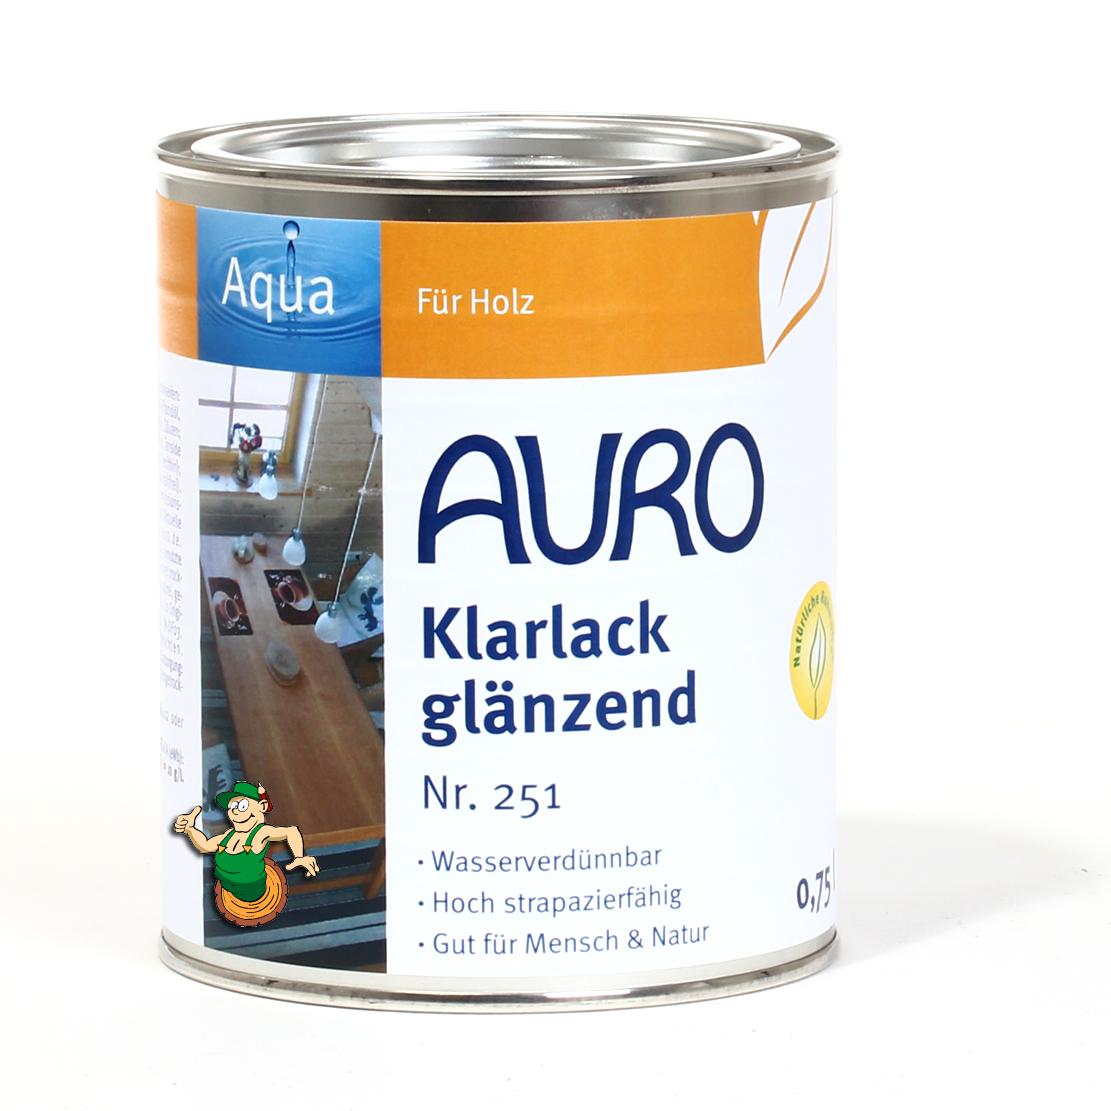 auro klarlack, glänzend nr. 251 | auro shop